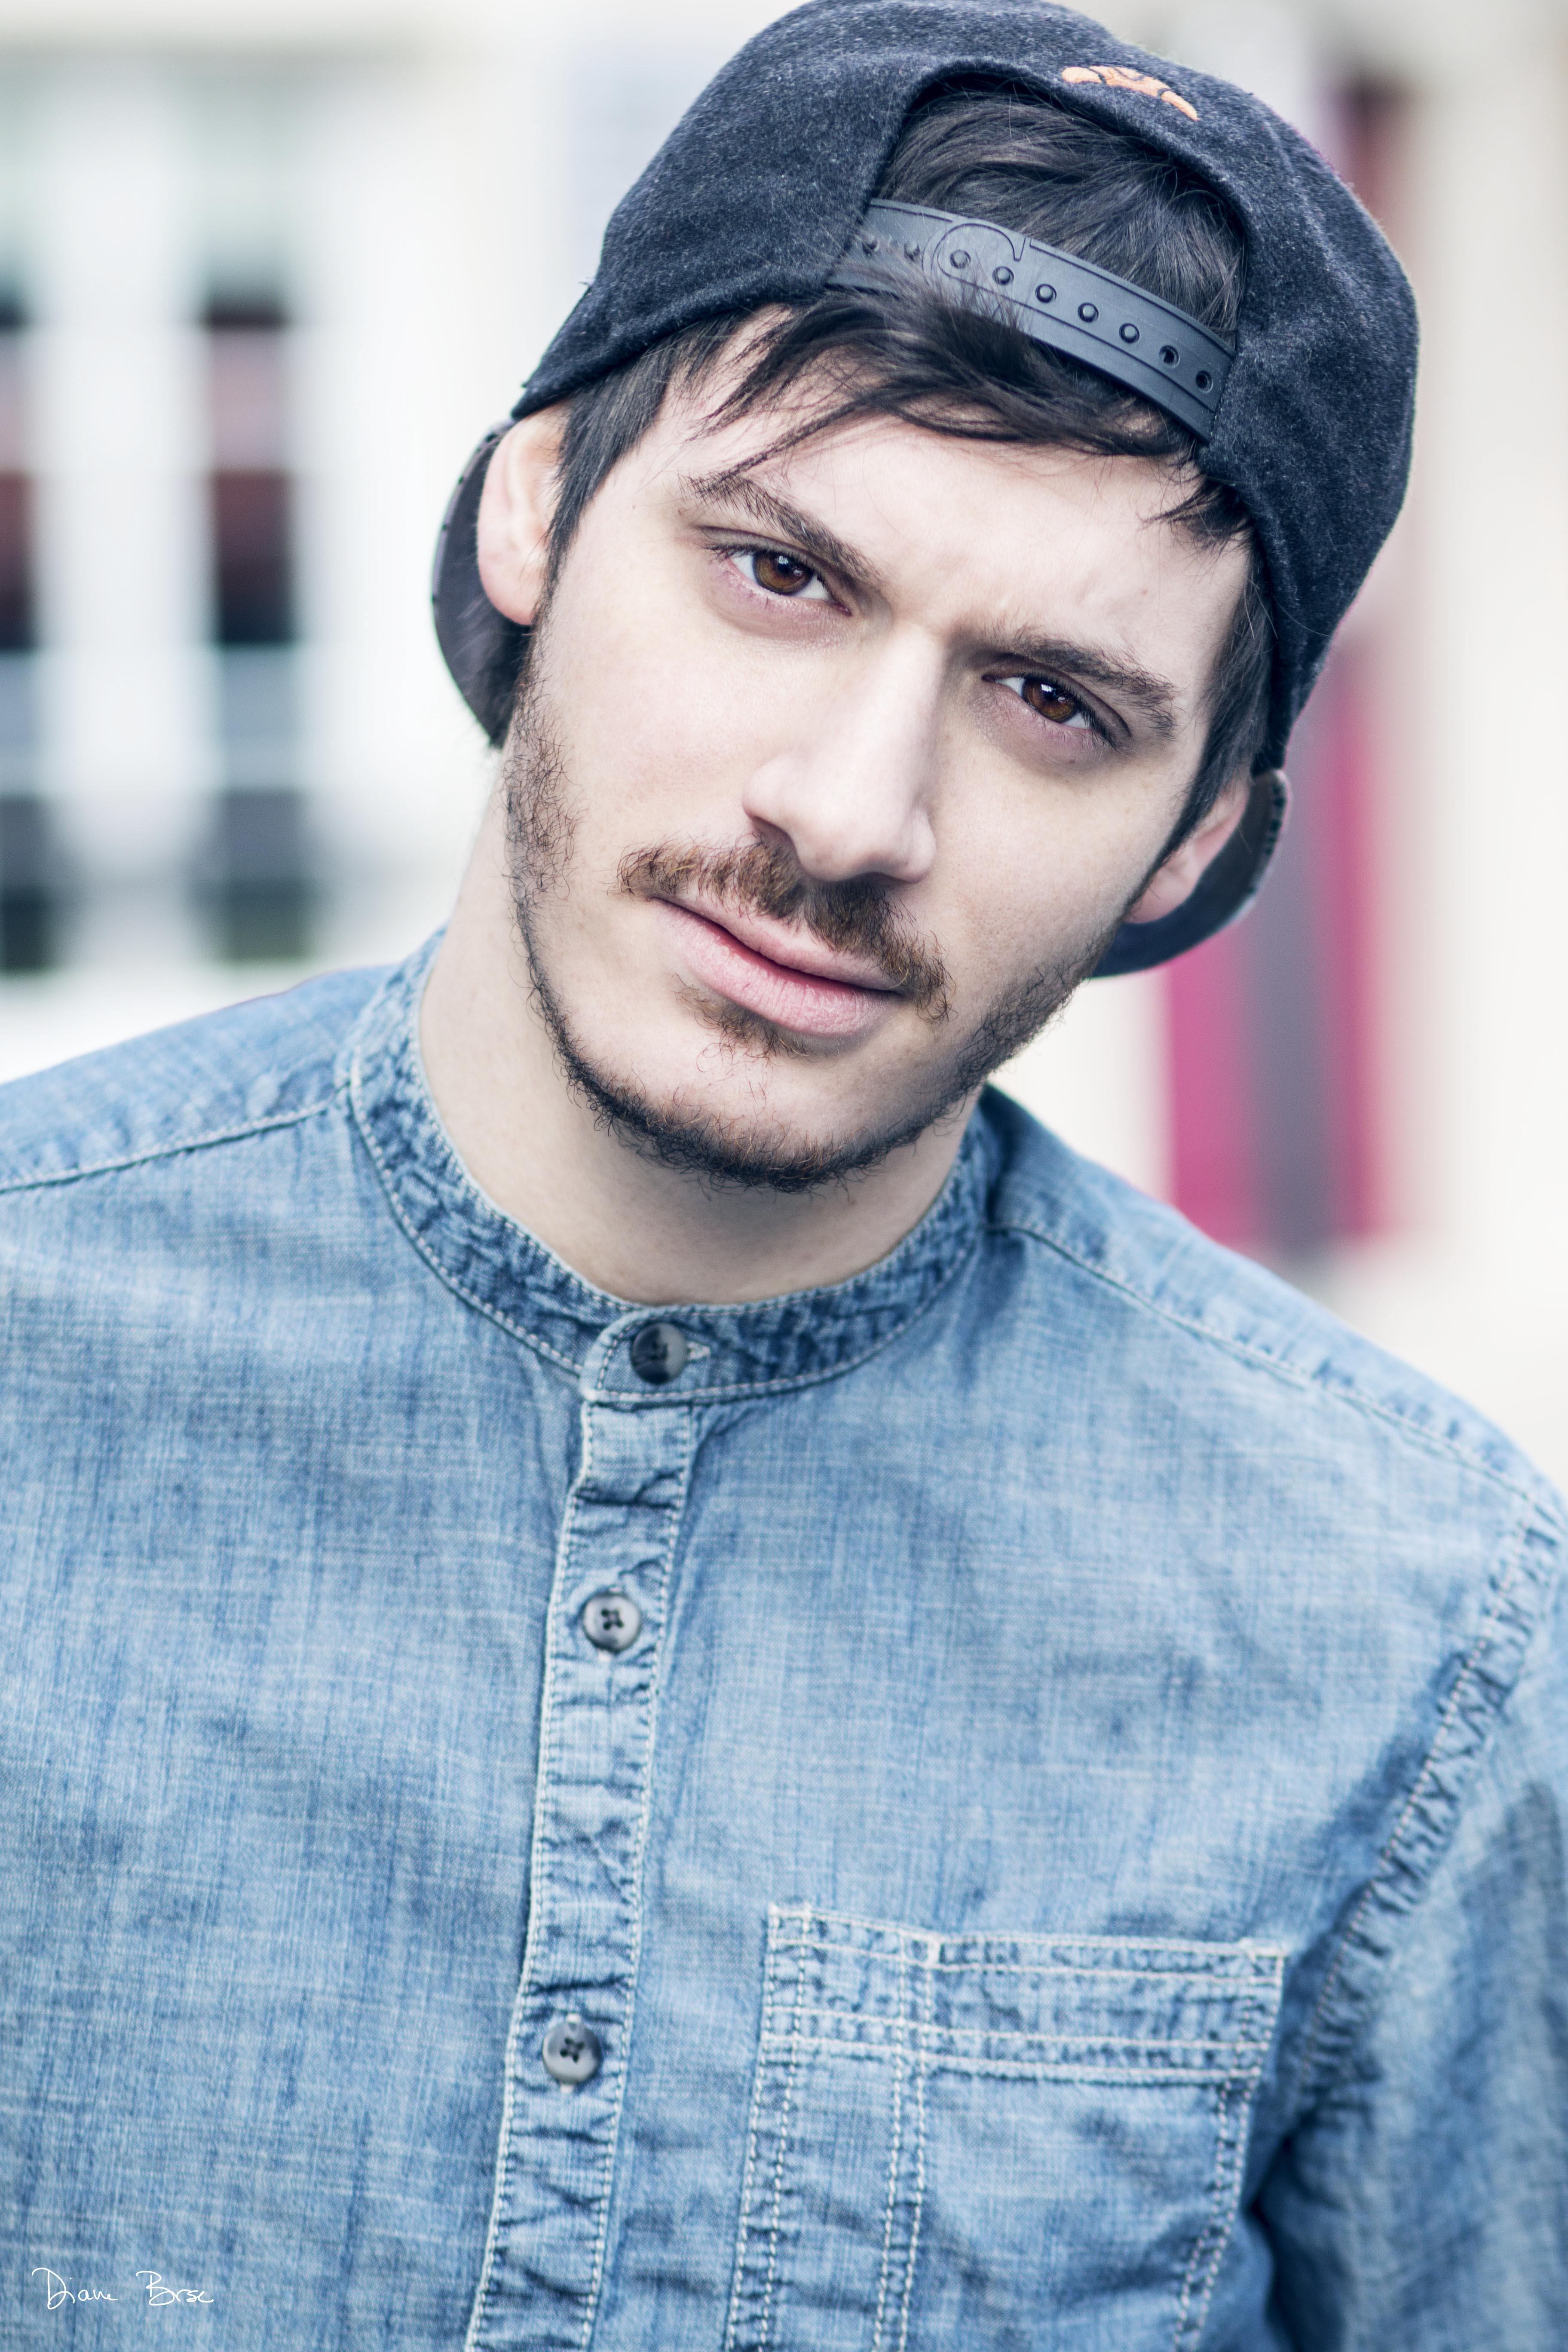 Joseph Wolfsohn - Actor